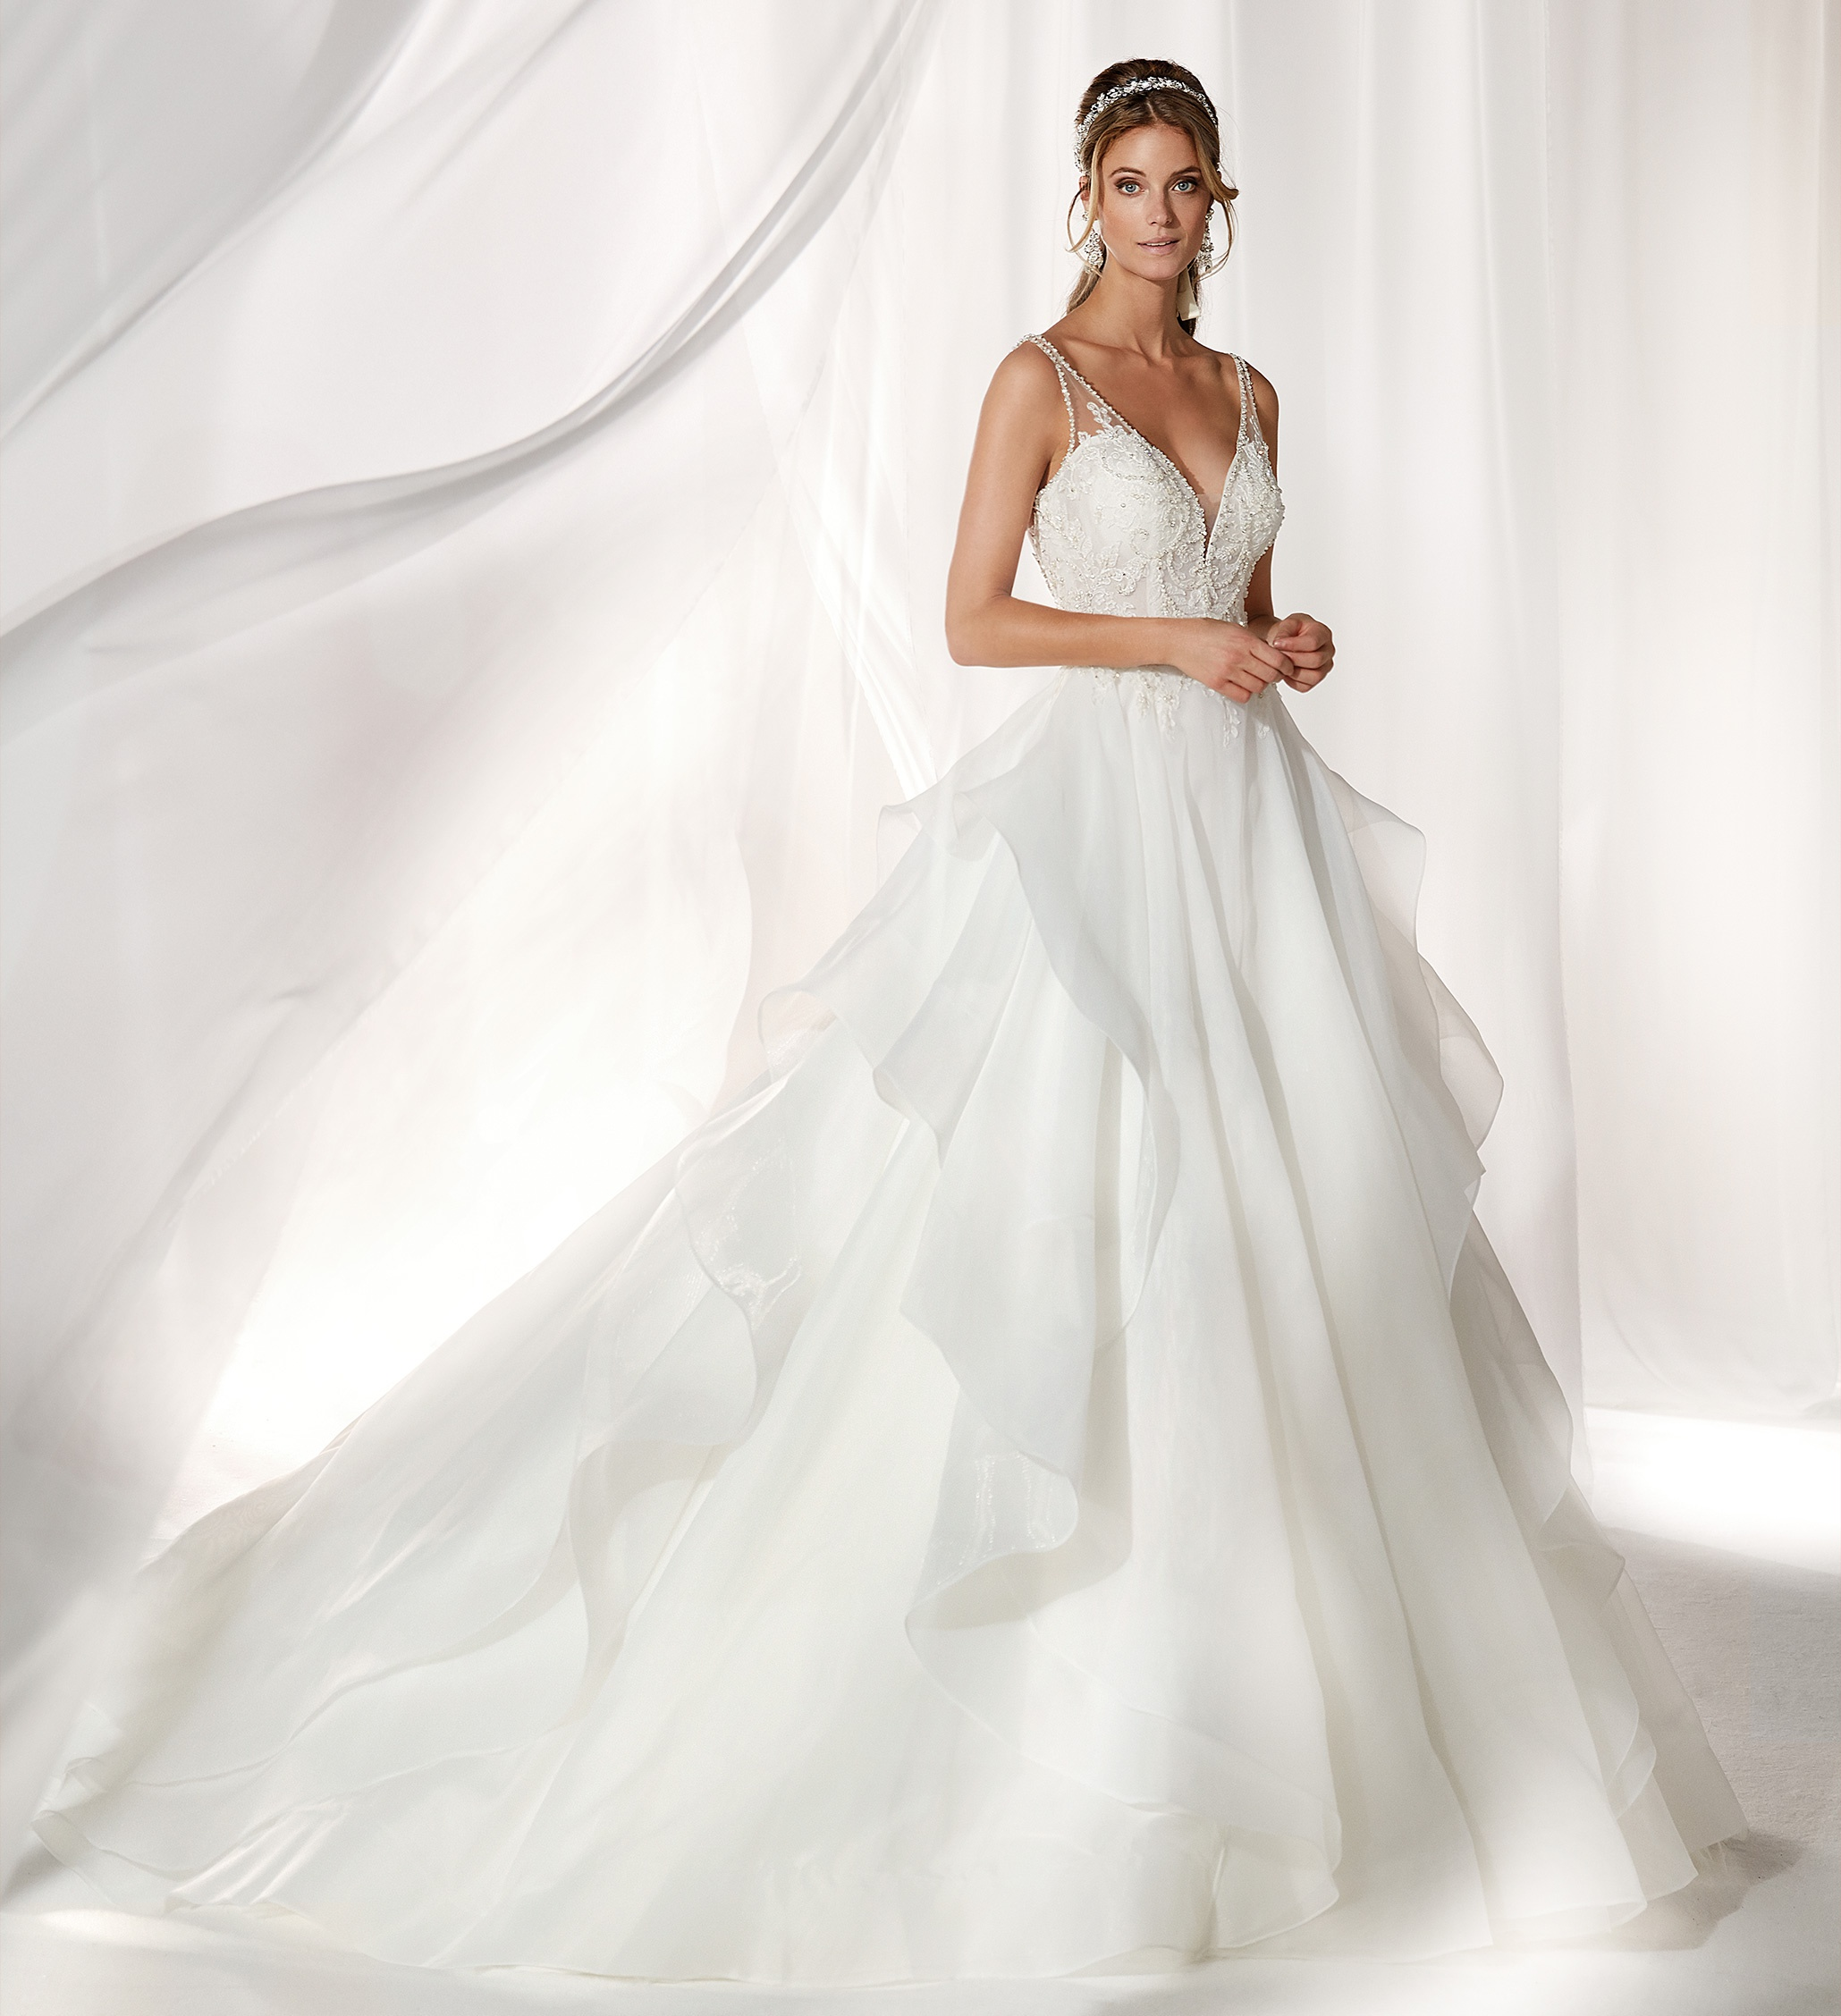 a56e5c6b07434 nicole-spose-NIAB19137-Nicole-moda-sposa-2019-465 ...